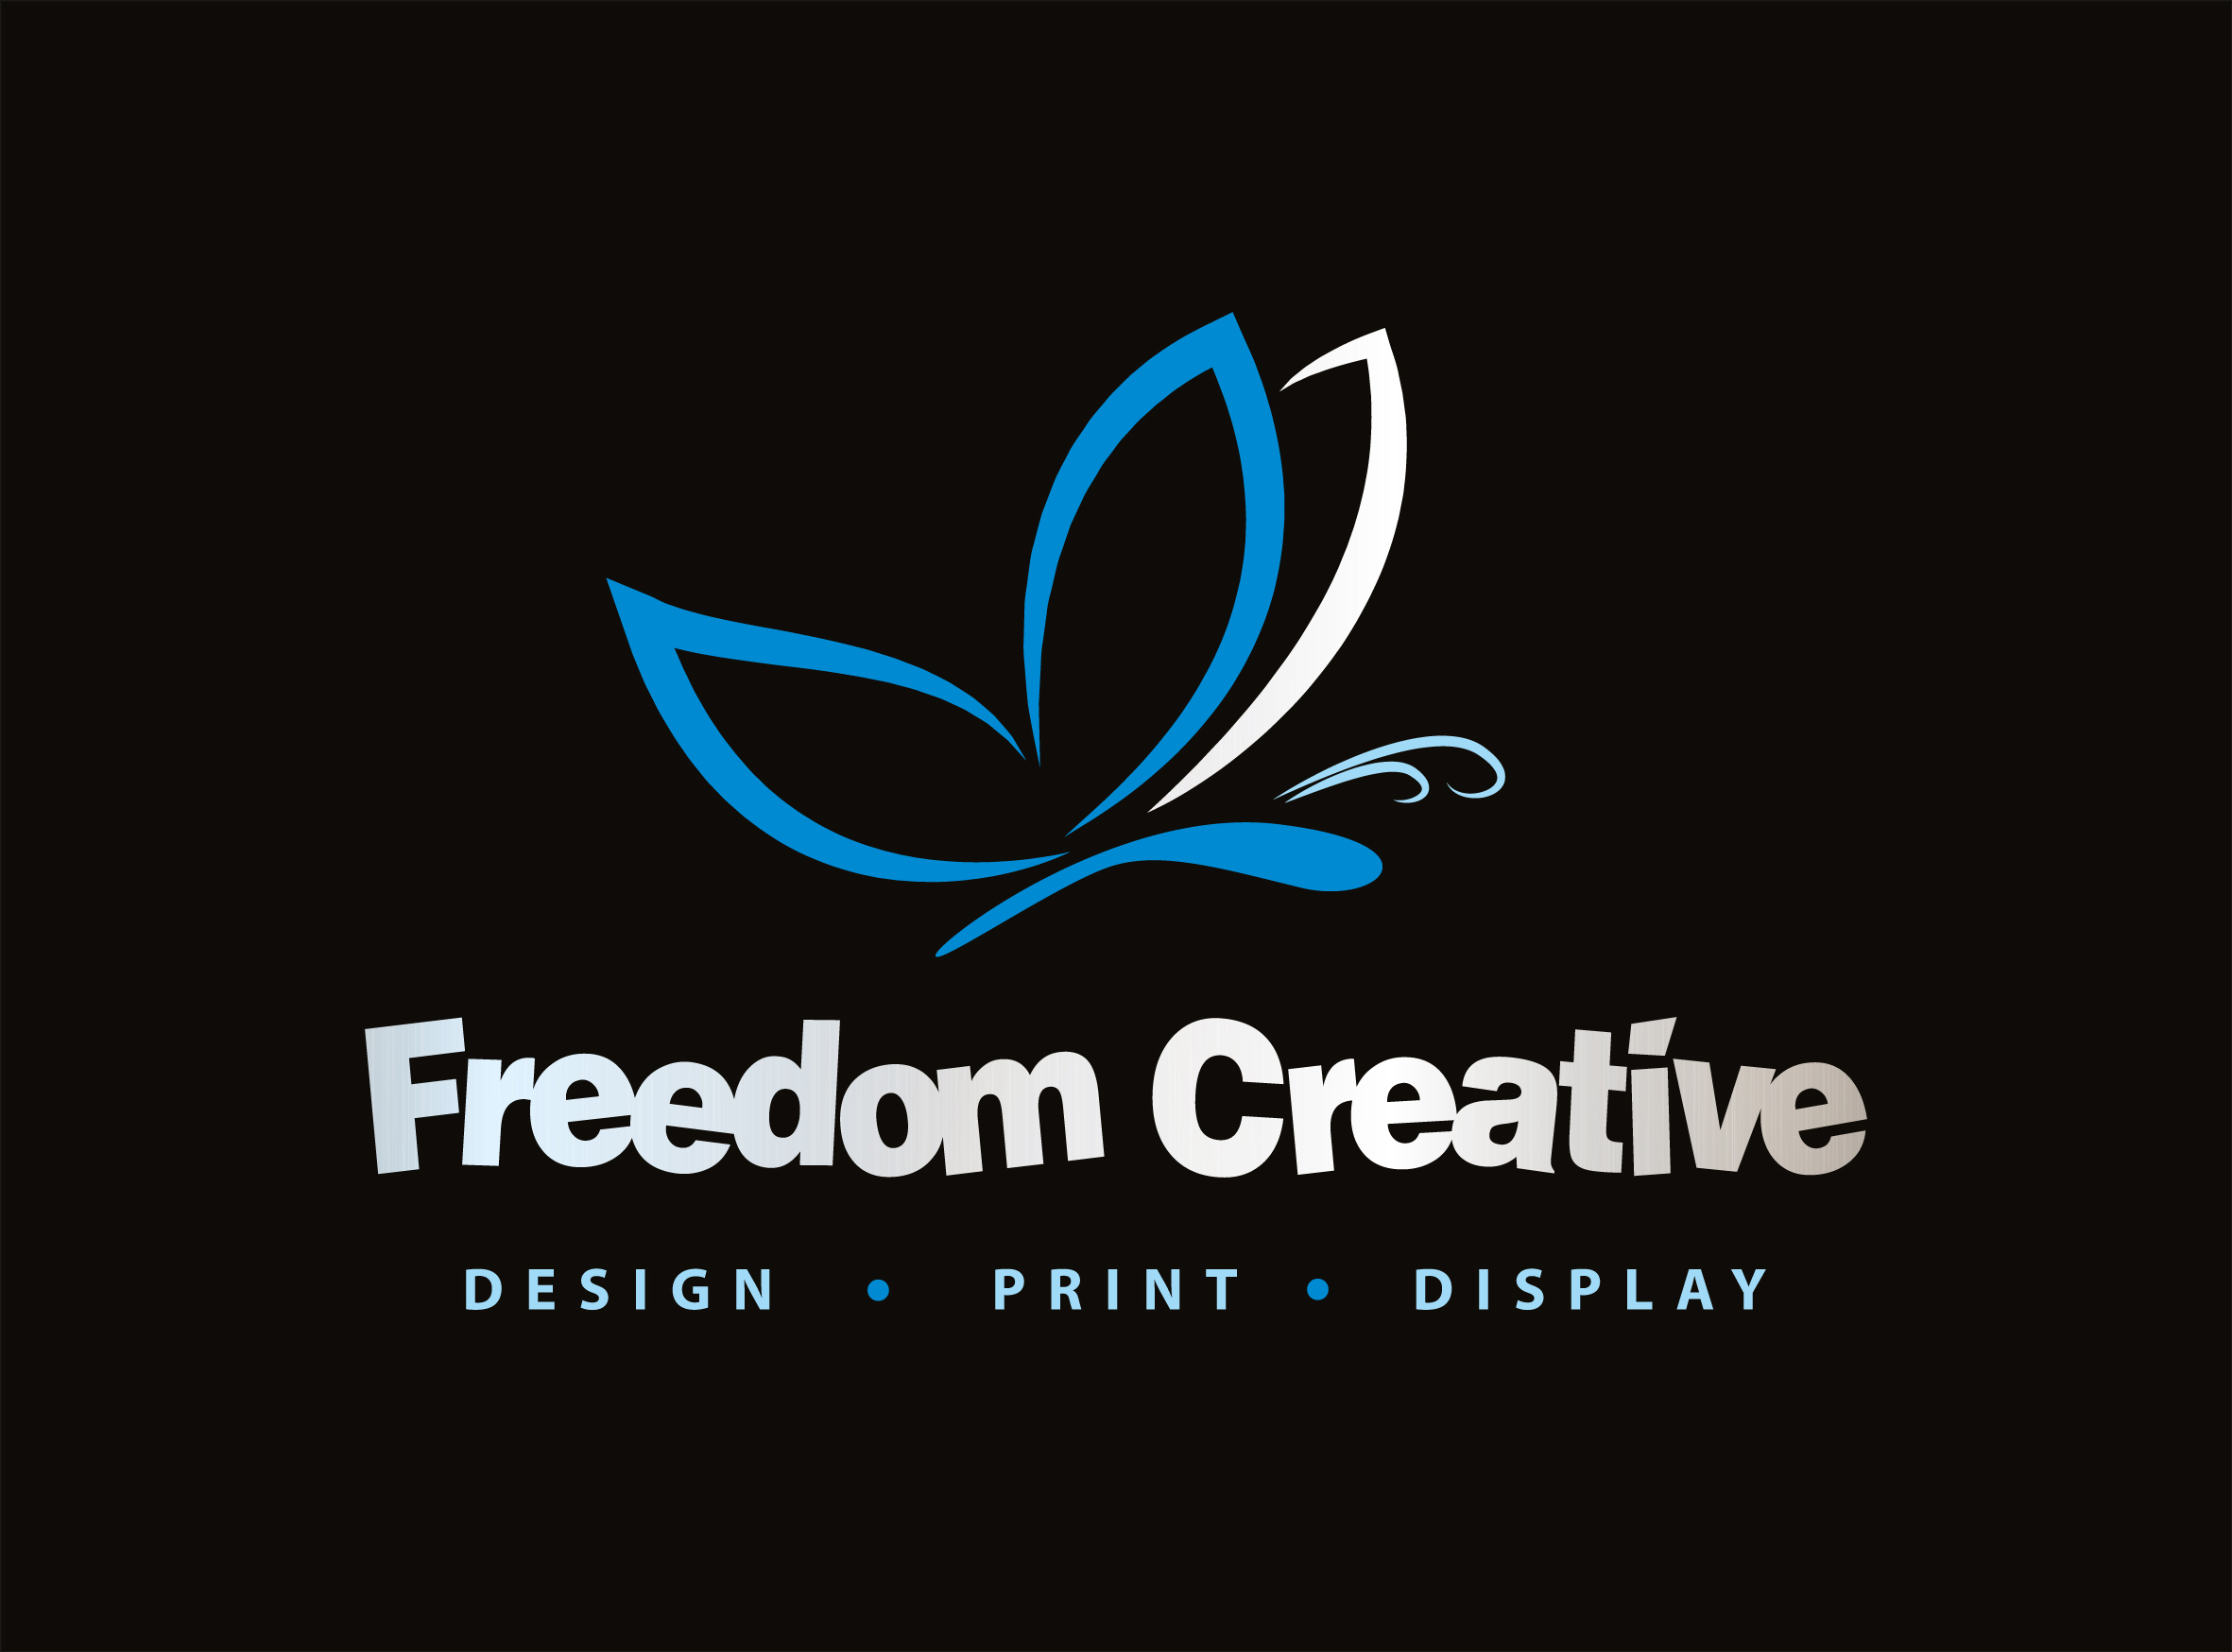 Freedom Creative